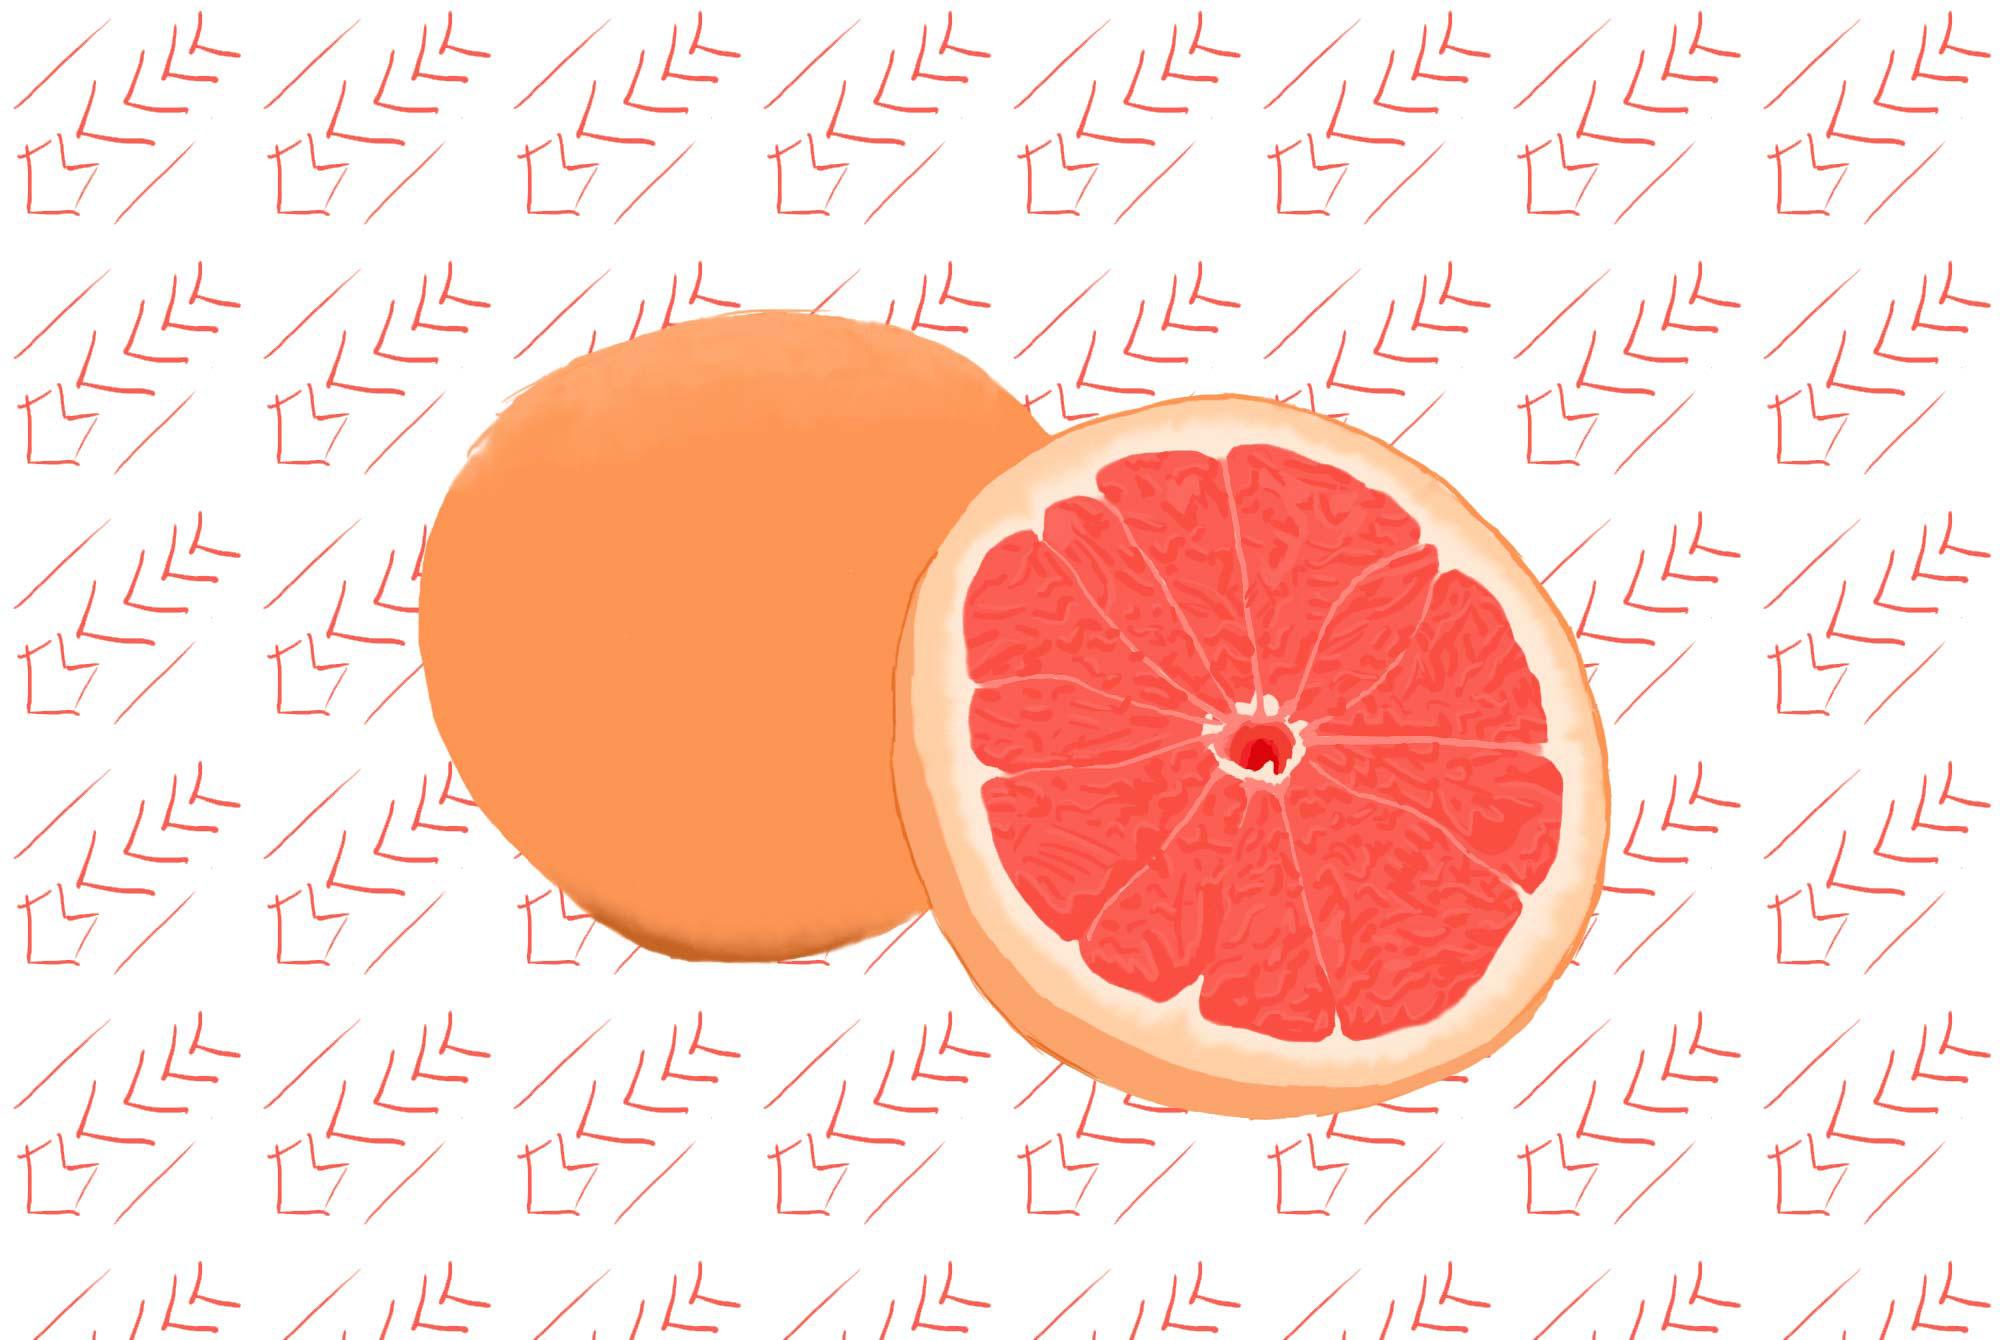 A Beer Lover's Pregnancy, Part III: Ultrasounds and Grapefruit Juice